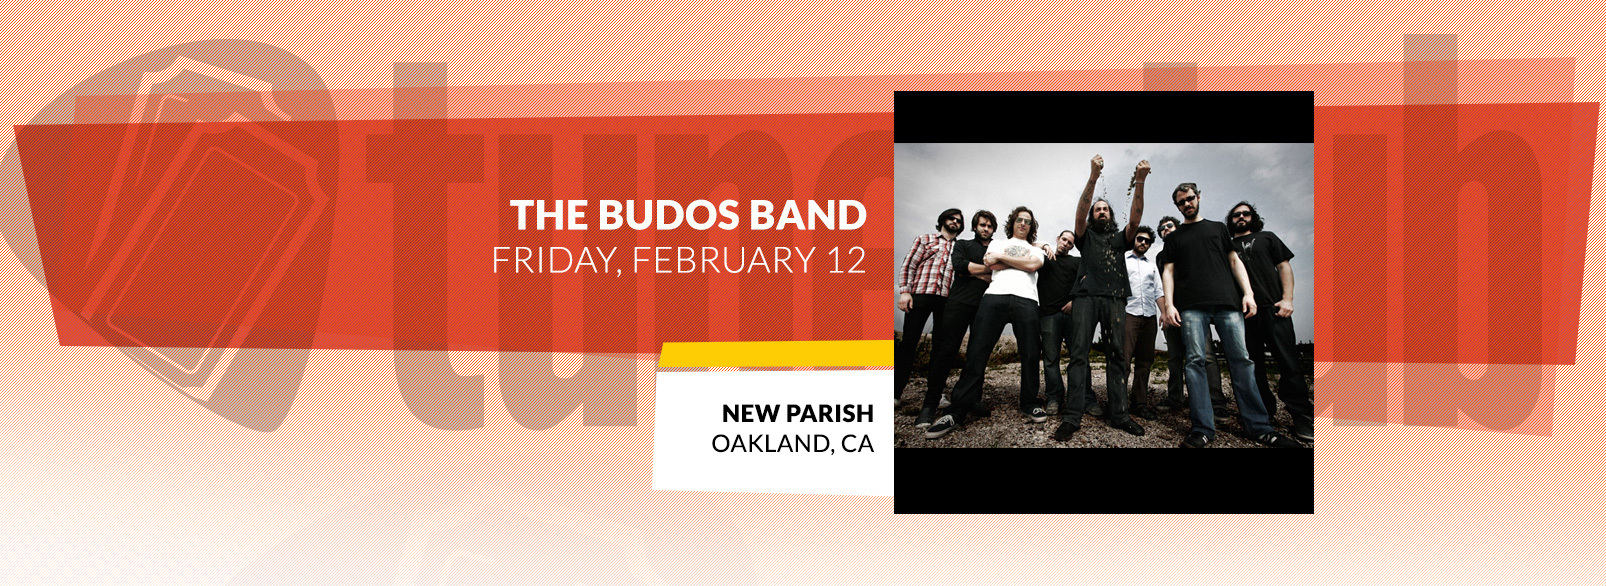 The Budos Band @ New Parish